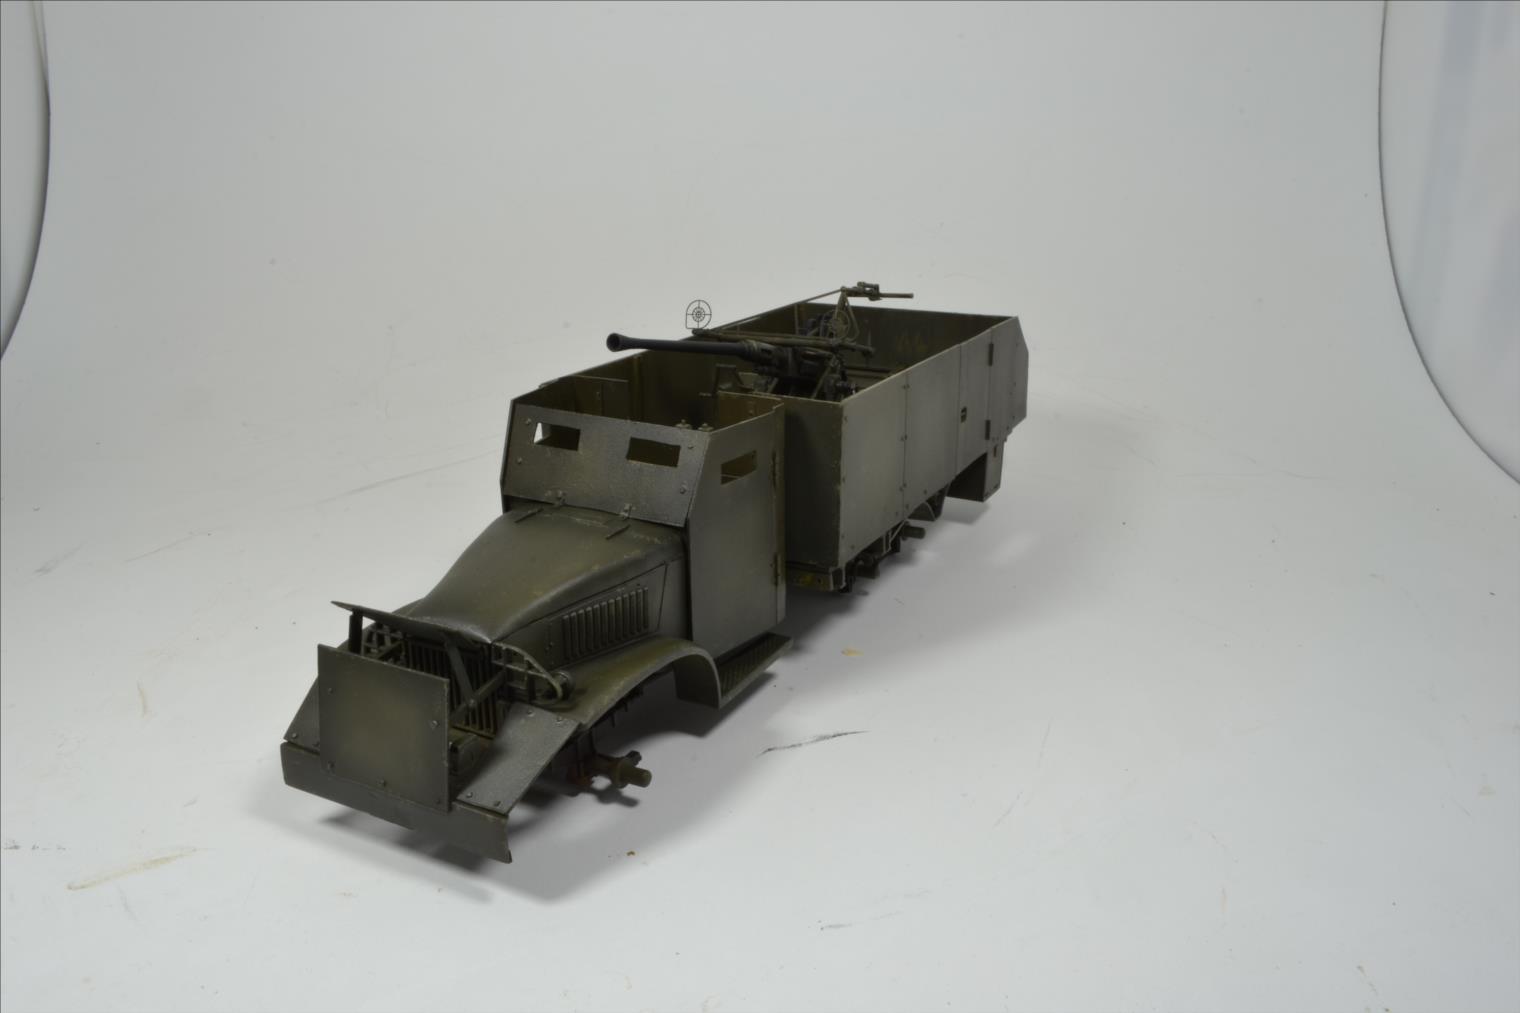 INDOCHINE GMC Bofors (Hobby Boss) 1/35 - Page 2 19122109484822494216568052